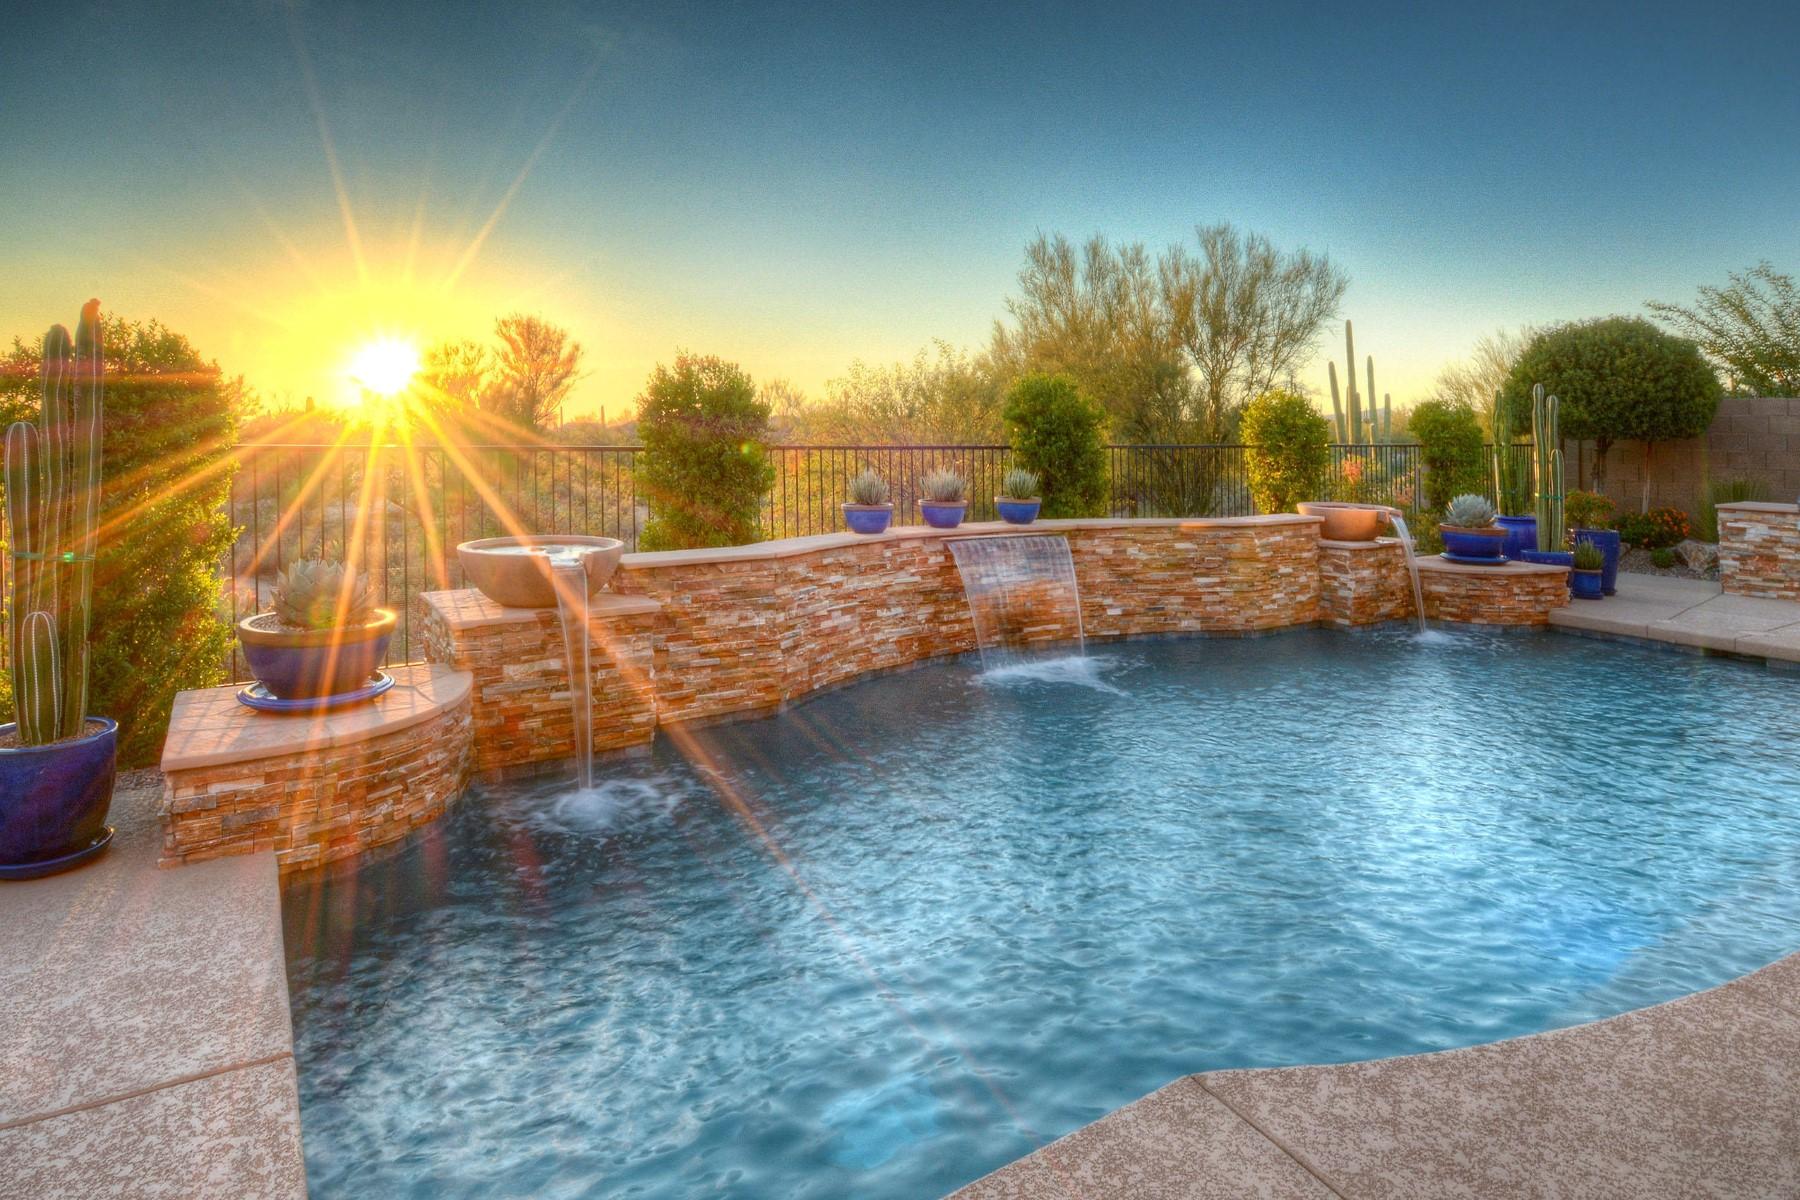 Property For Sale at Desert elegance, wonderful sw contemporary design